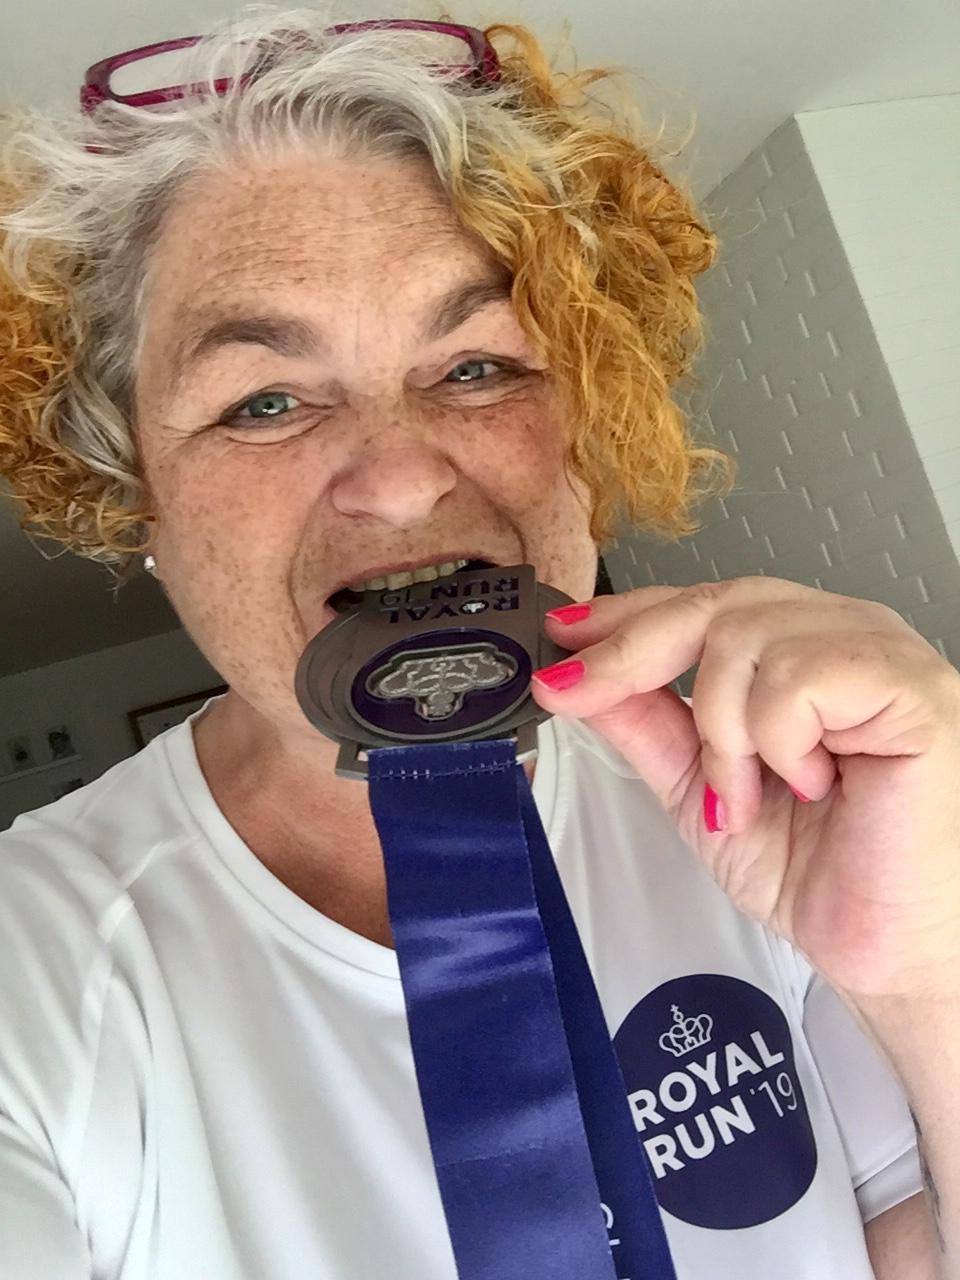 royal-run-2019-aalborg_48037472723_o